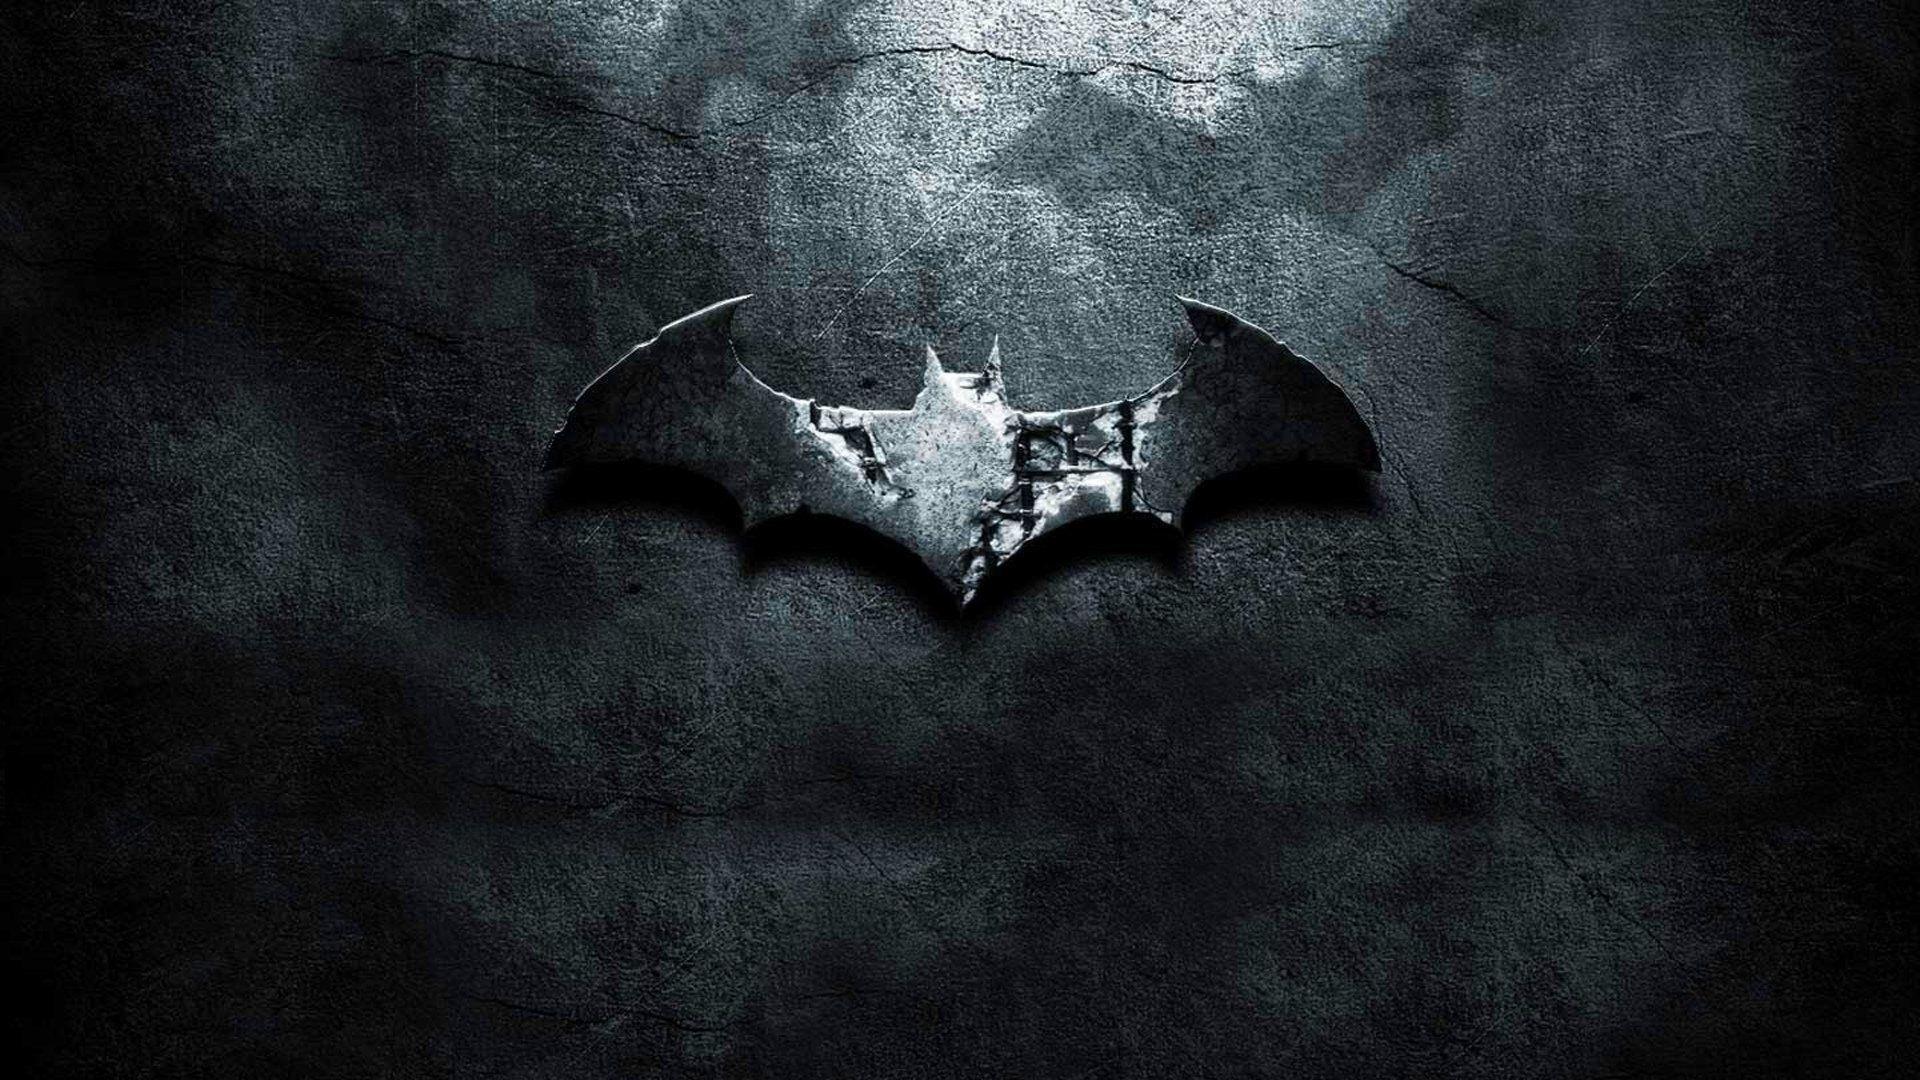 Title Batman Symbol Wallpaper Hd 67 Images Dimension  File Type Jpg Jpeg